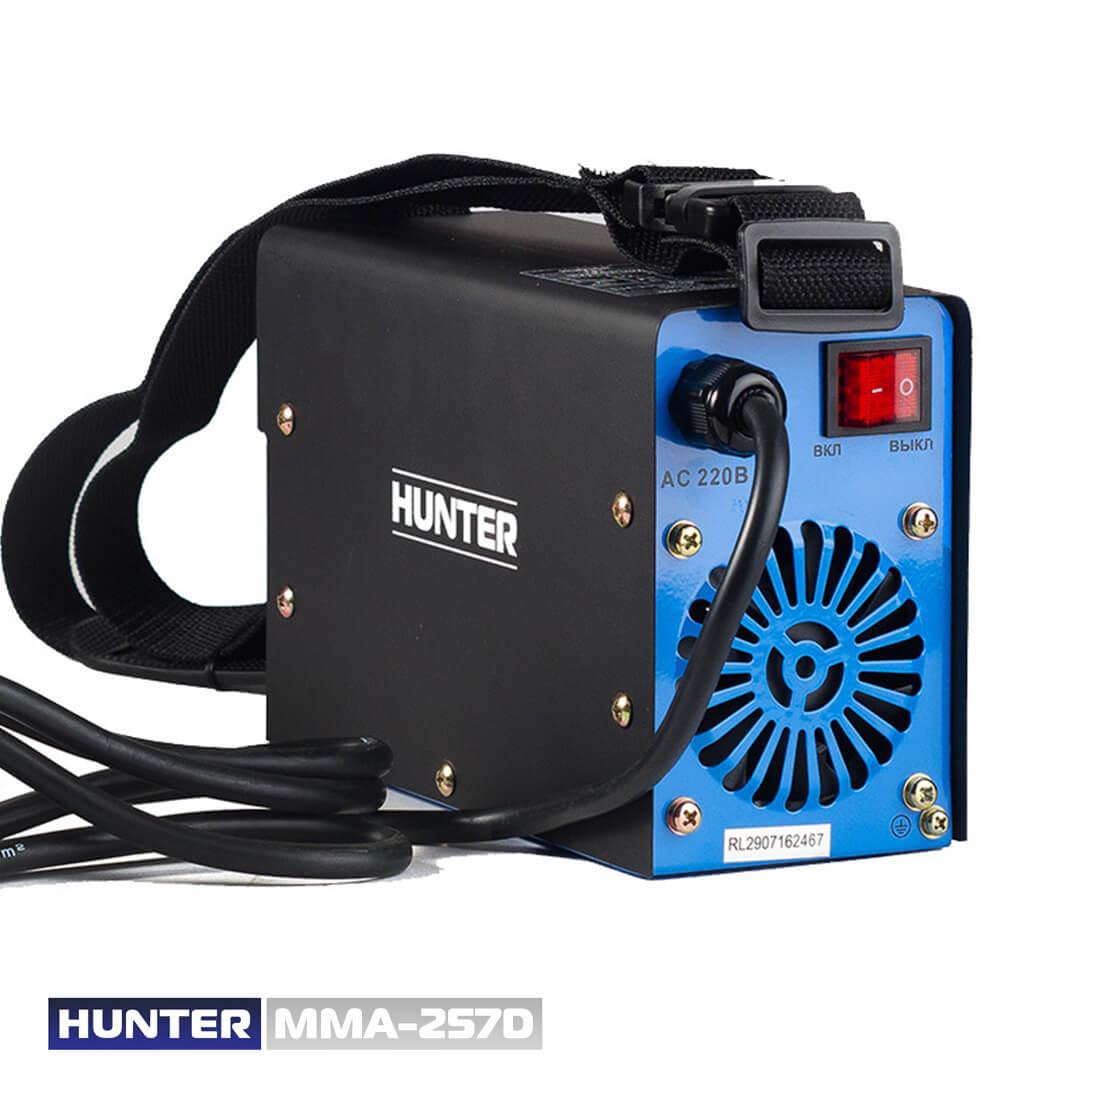 Фото Hunter MMA 257D (дуговая) цена 2250грн №3 — Hunter